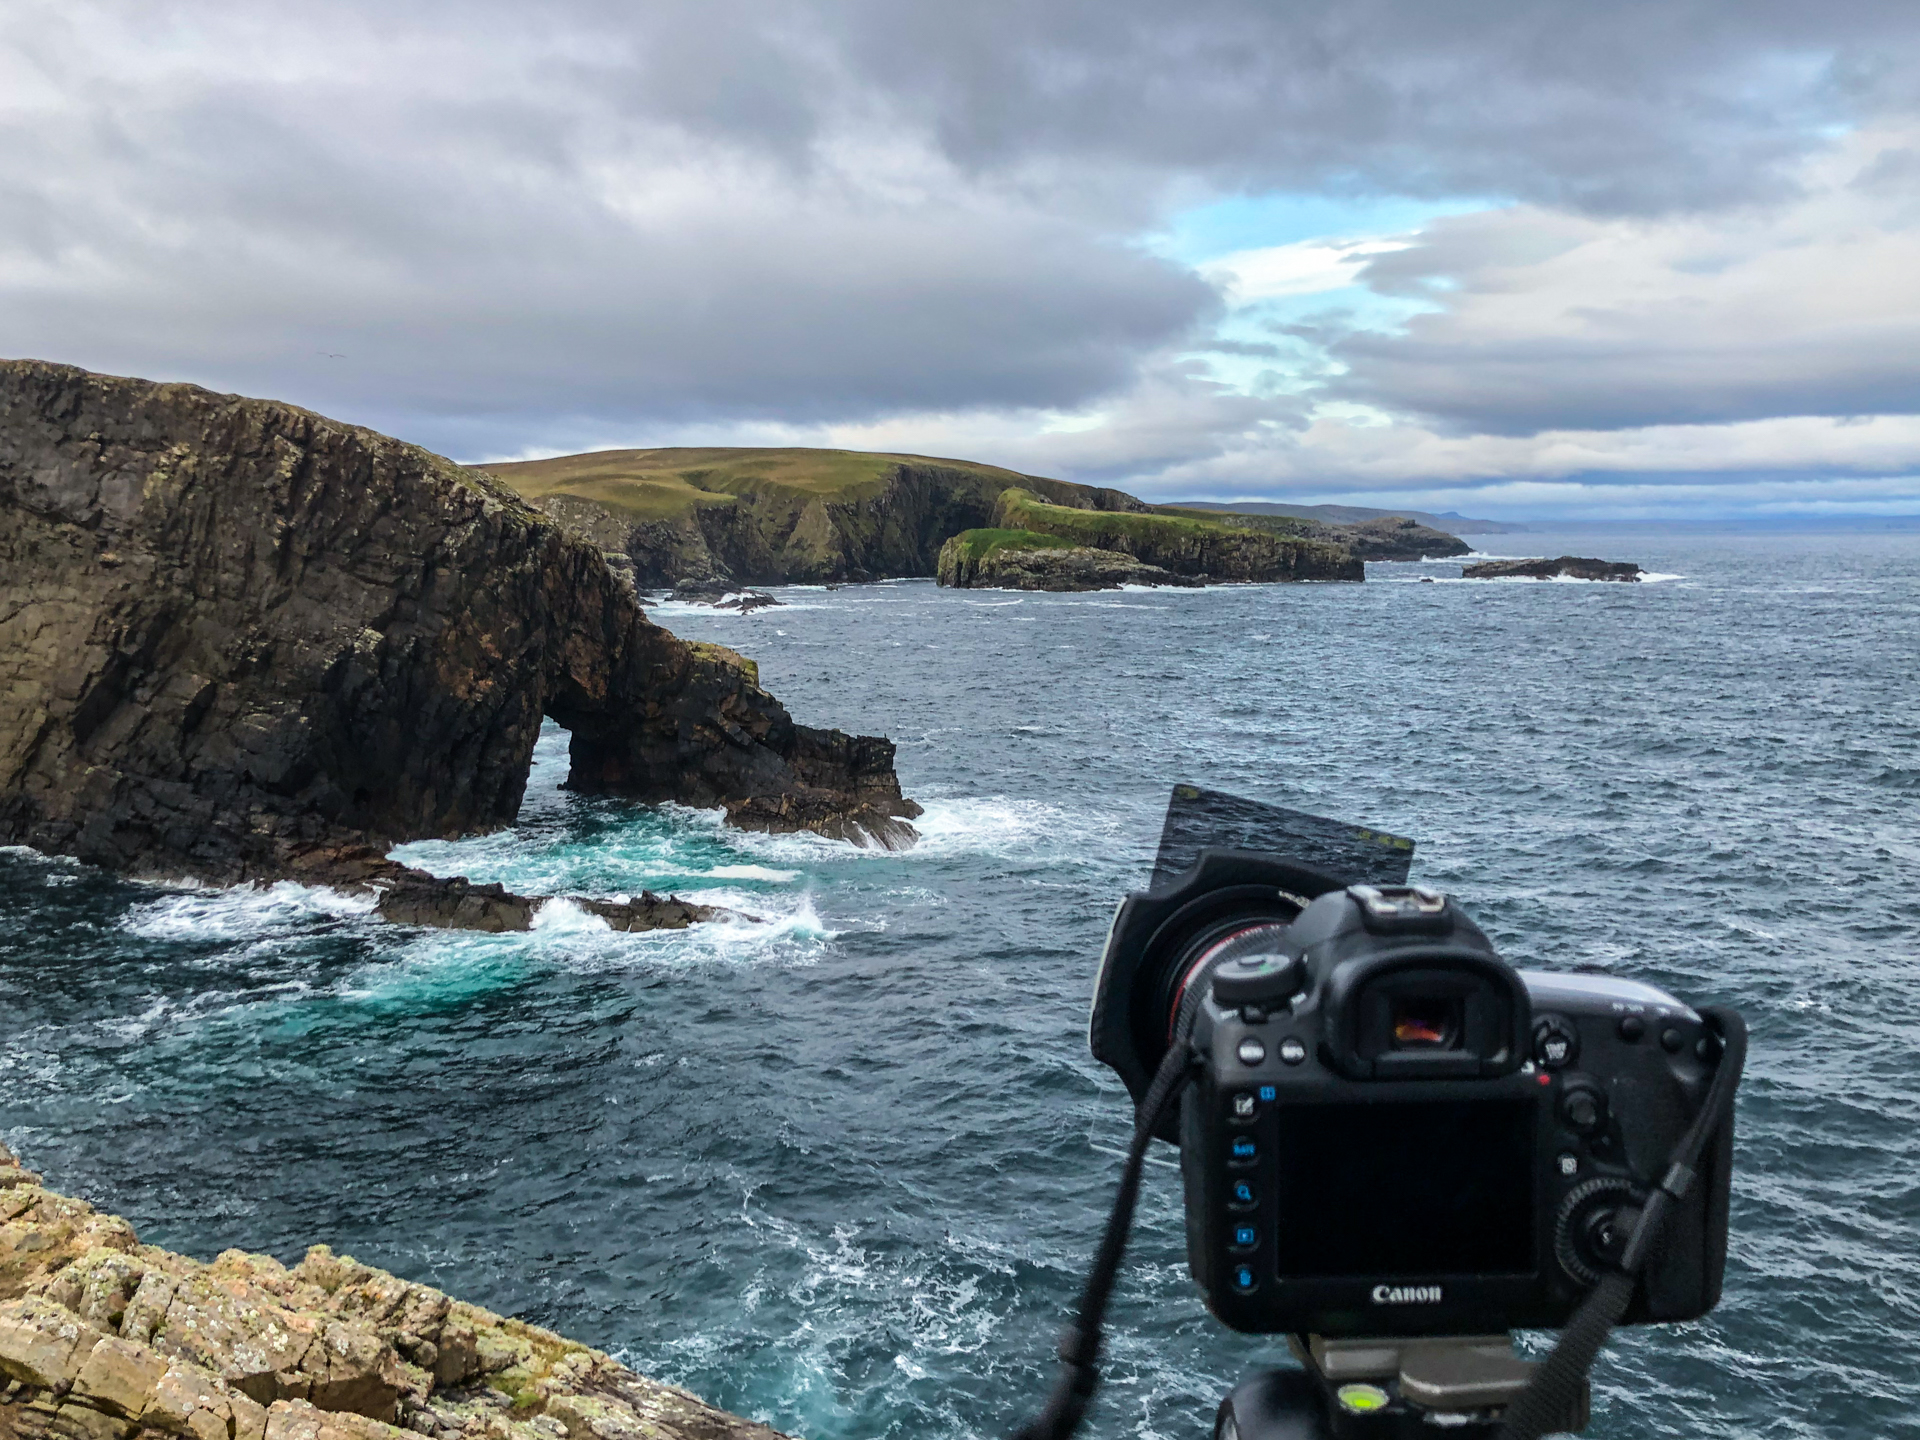 Camera on a tripod overlooking a rocky coast